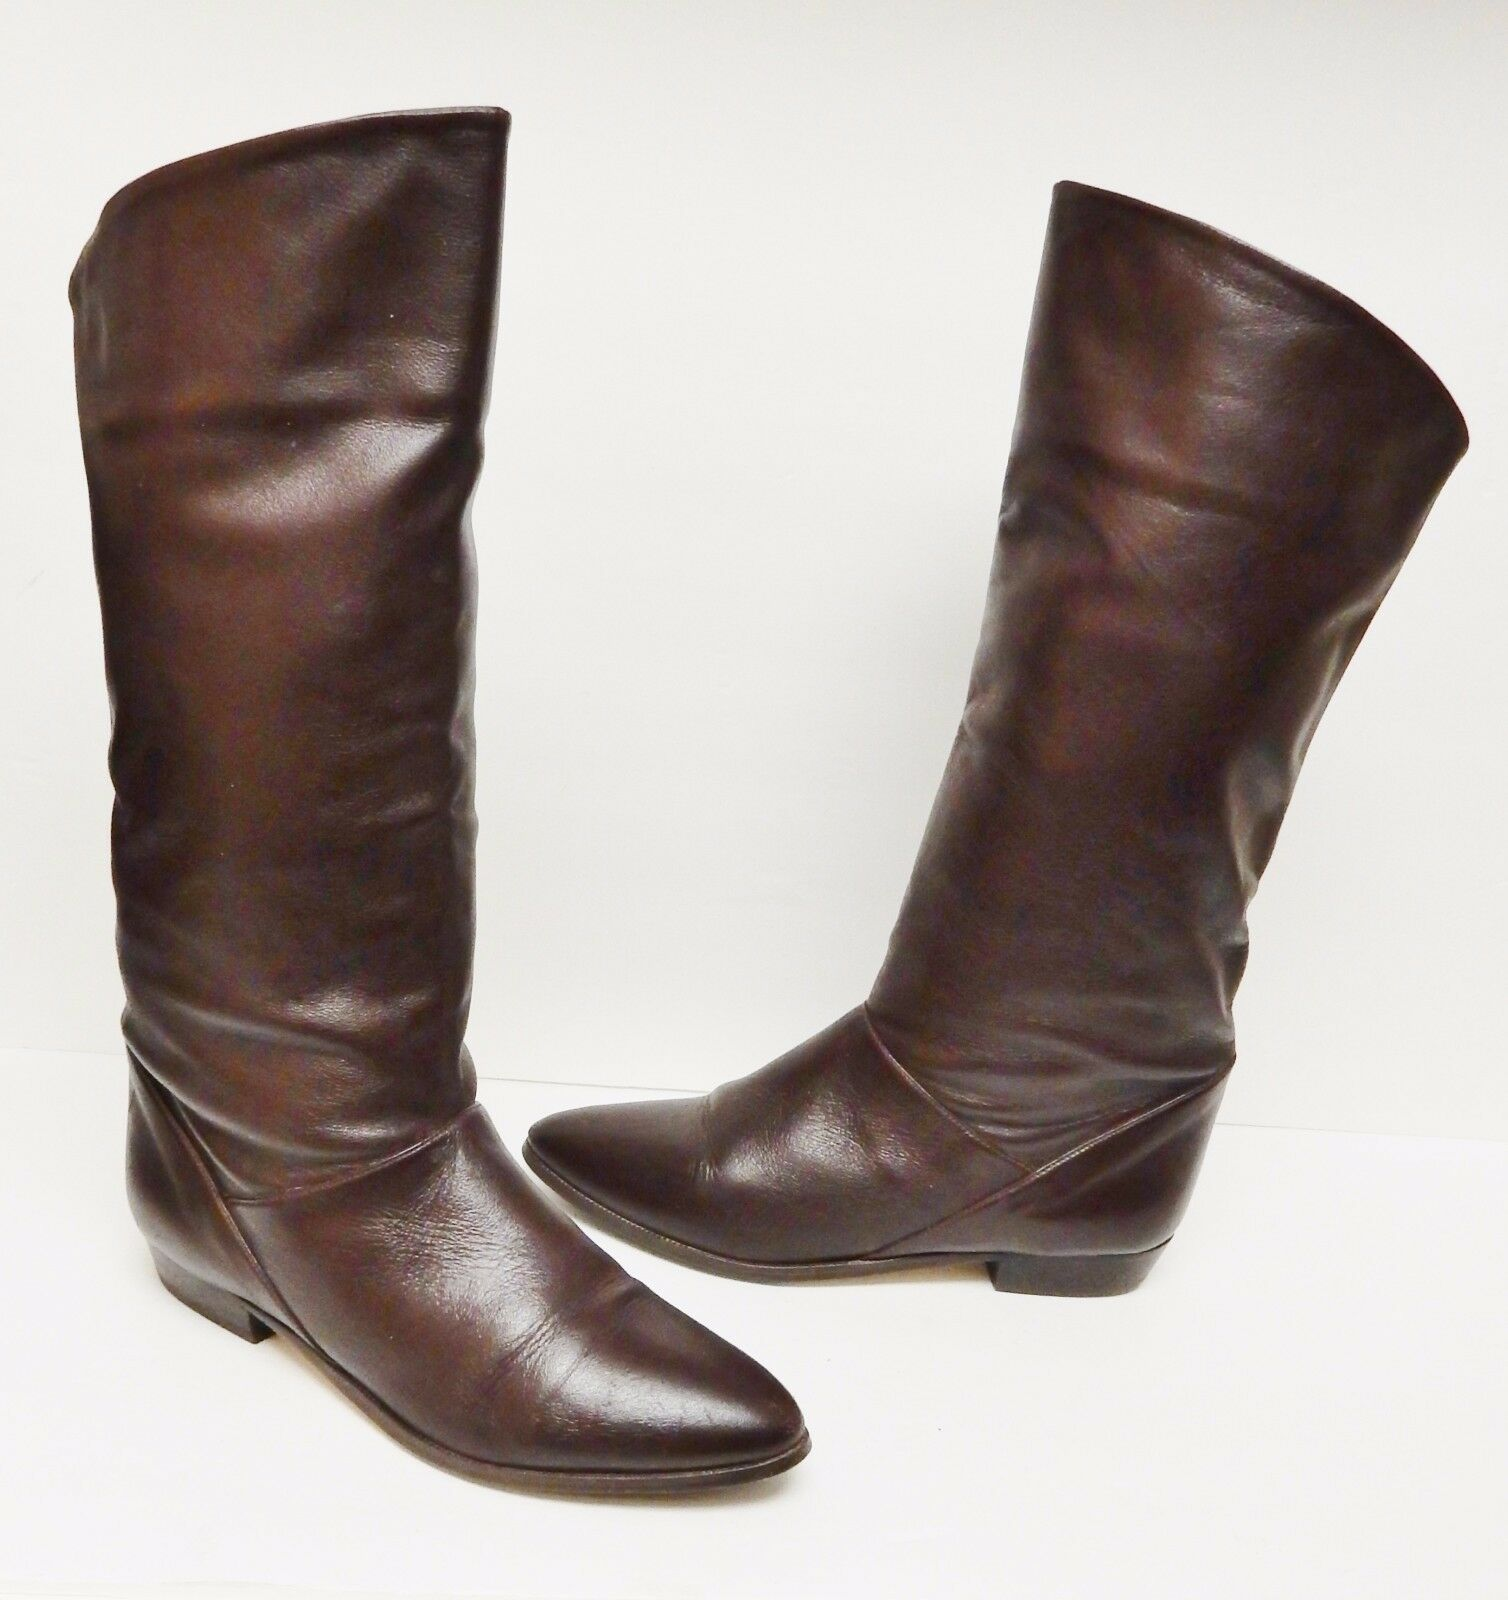 Ellemenno Boots Leather TRAZE Riding Equestrian Western Brown 6.5 M VINTAGE